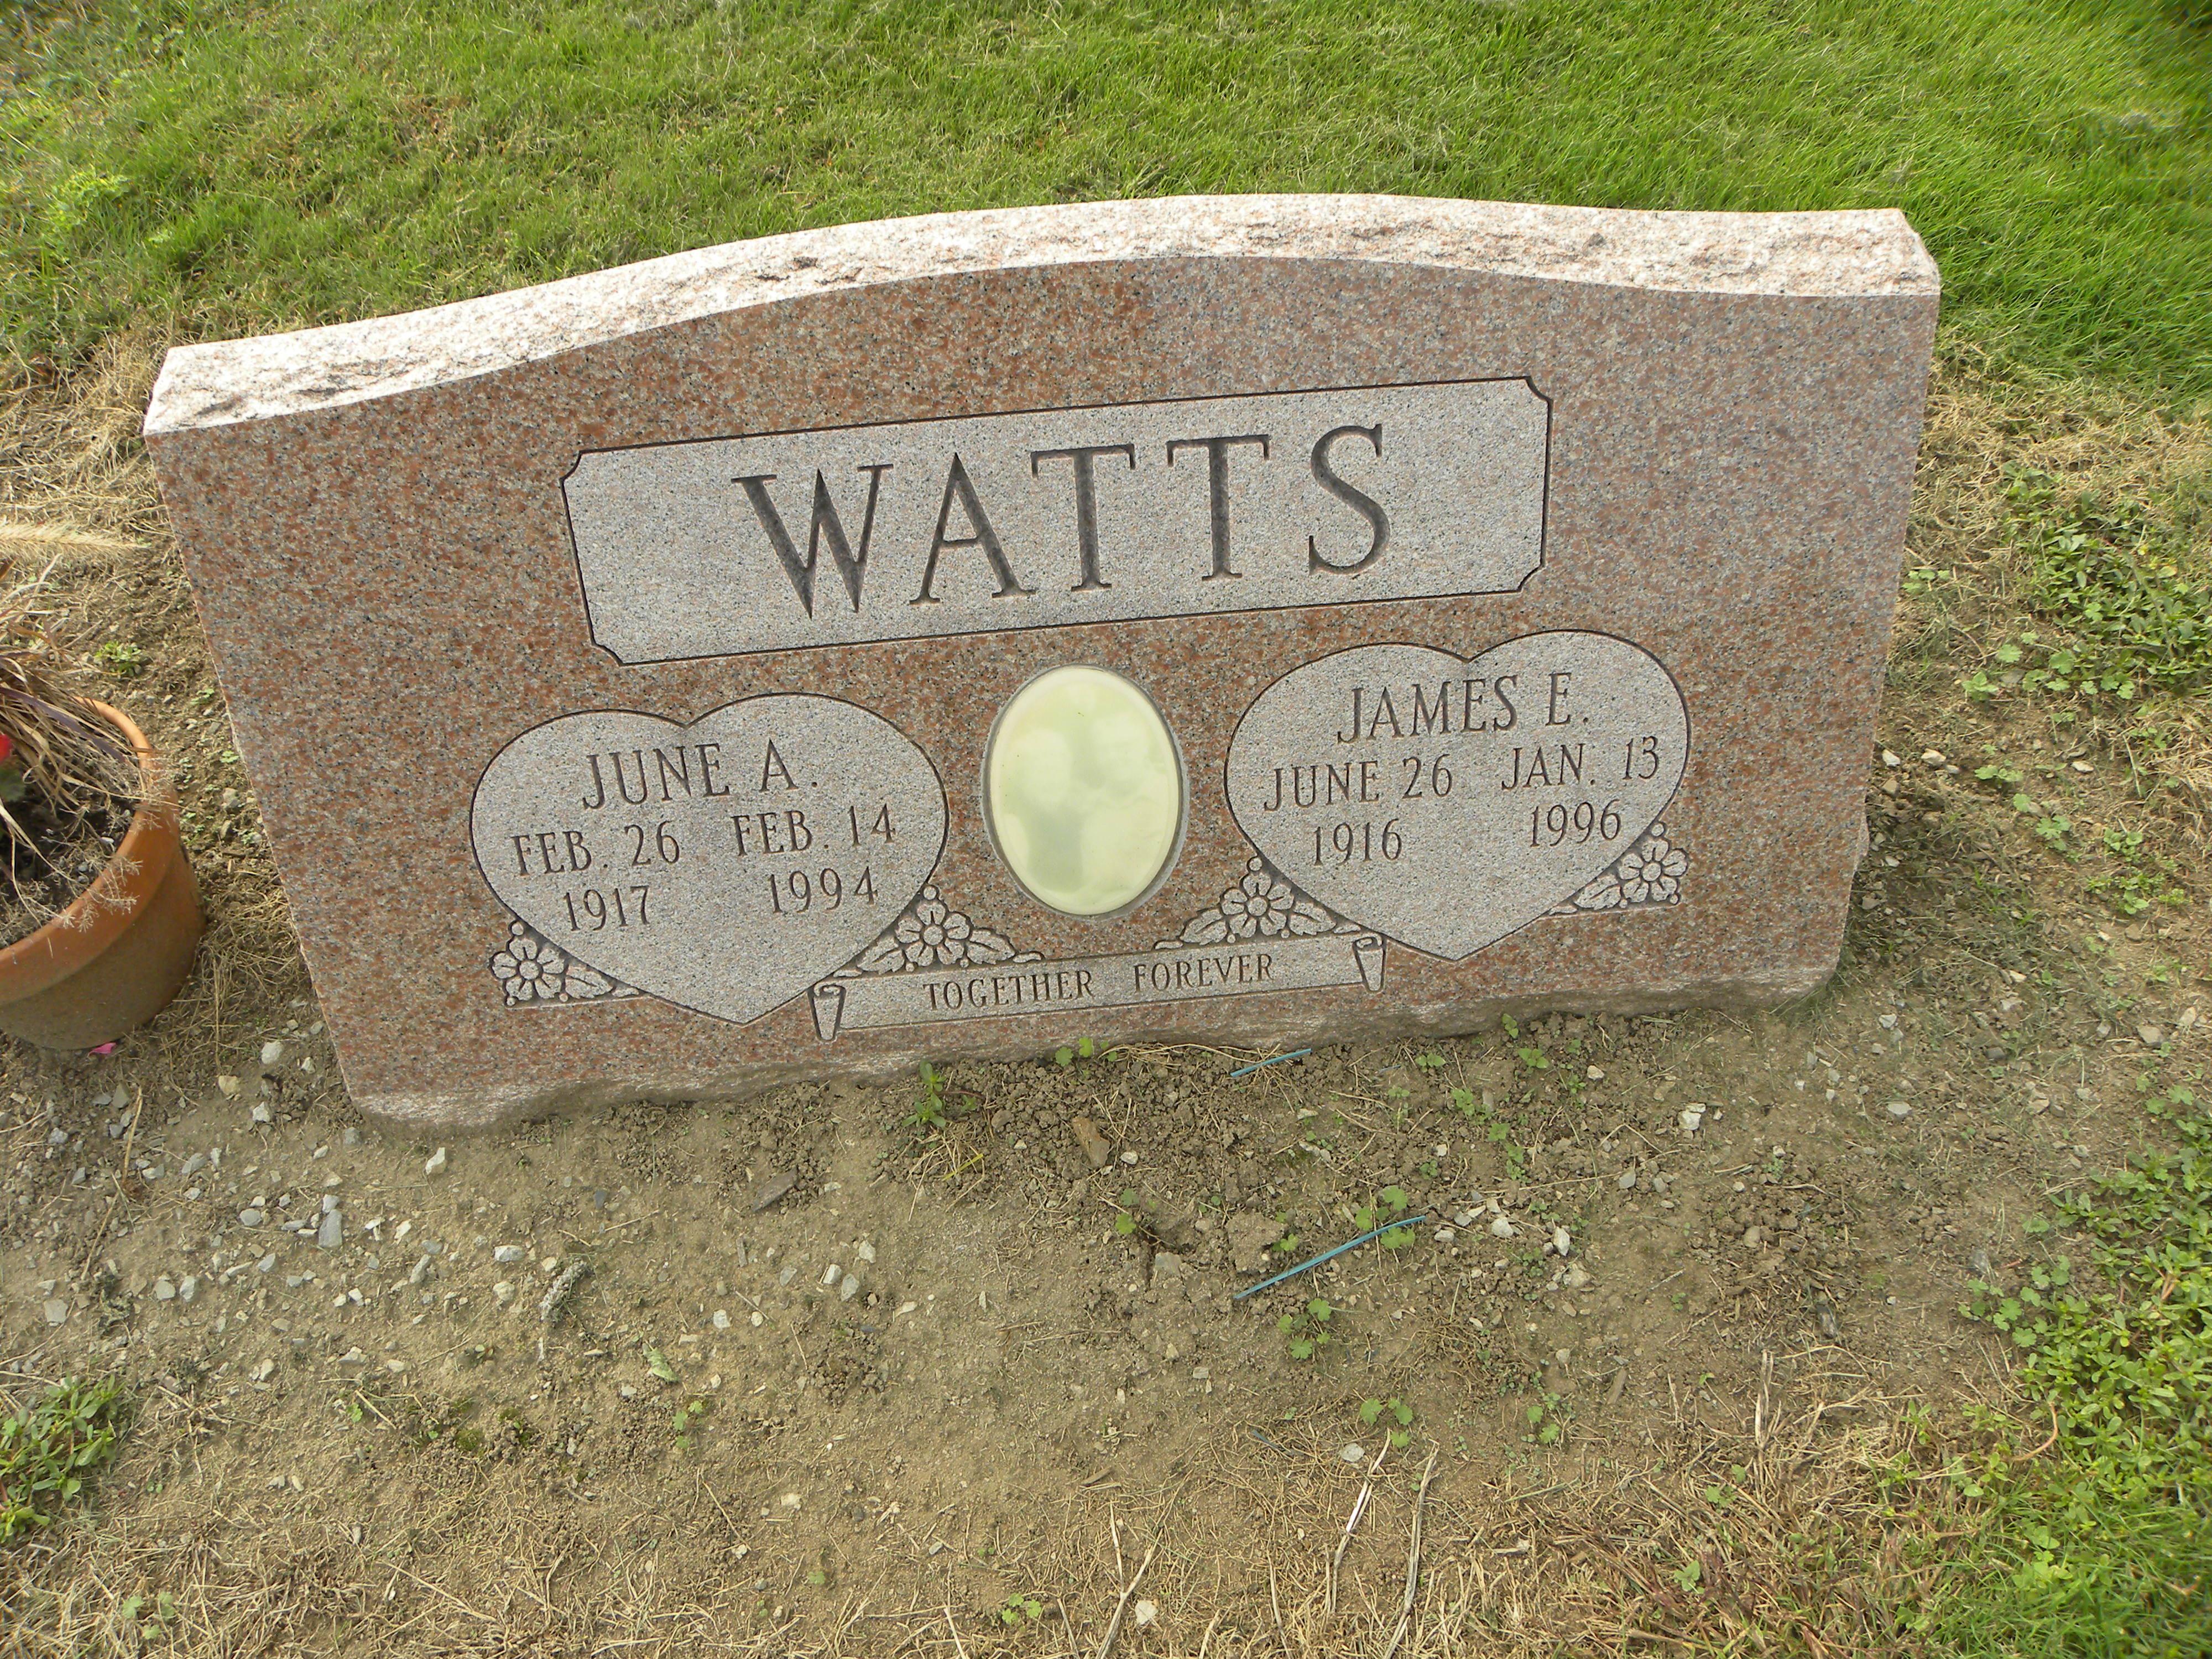 James E Watts